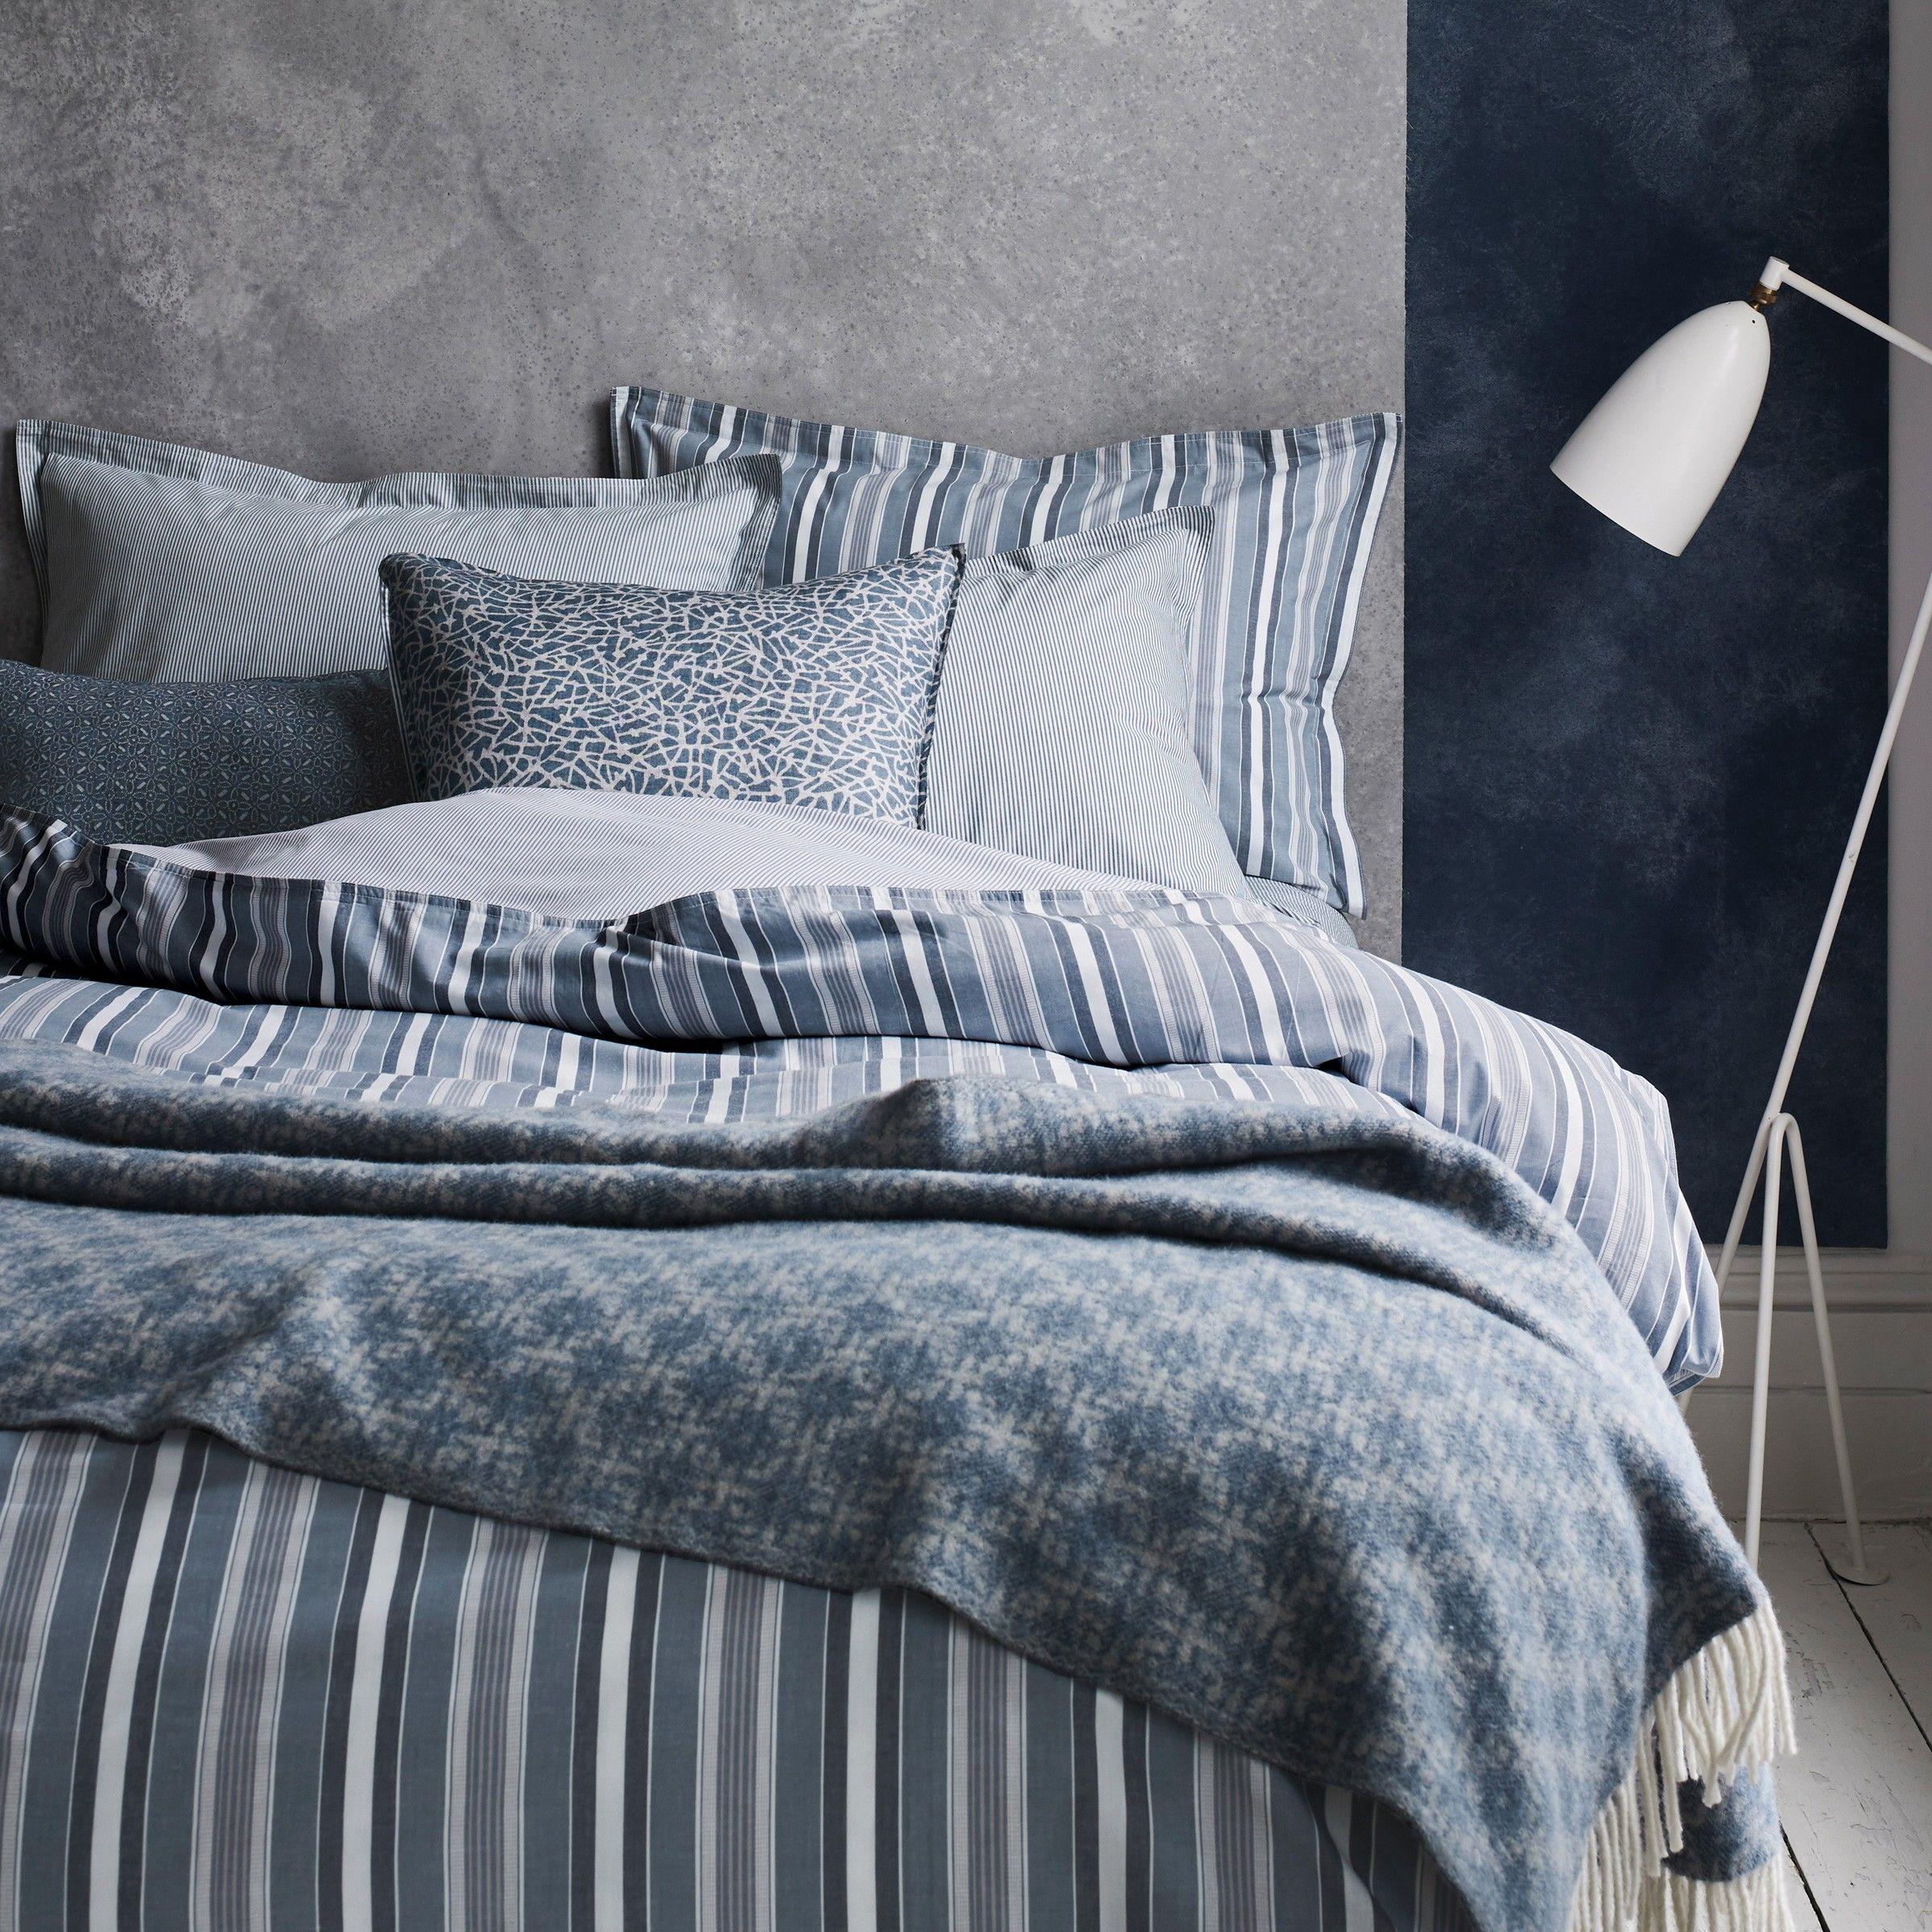 Murmur Kyoto Stripe Bedding In Copenhagen Blue Murmur Bed Blue